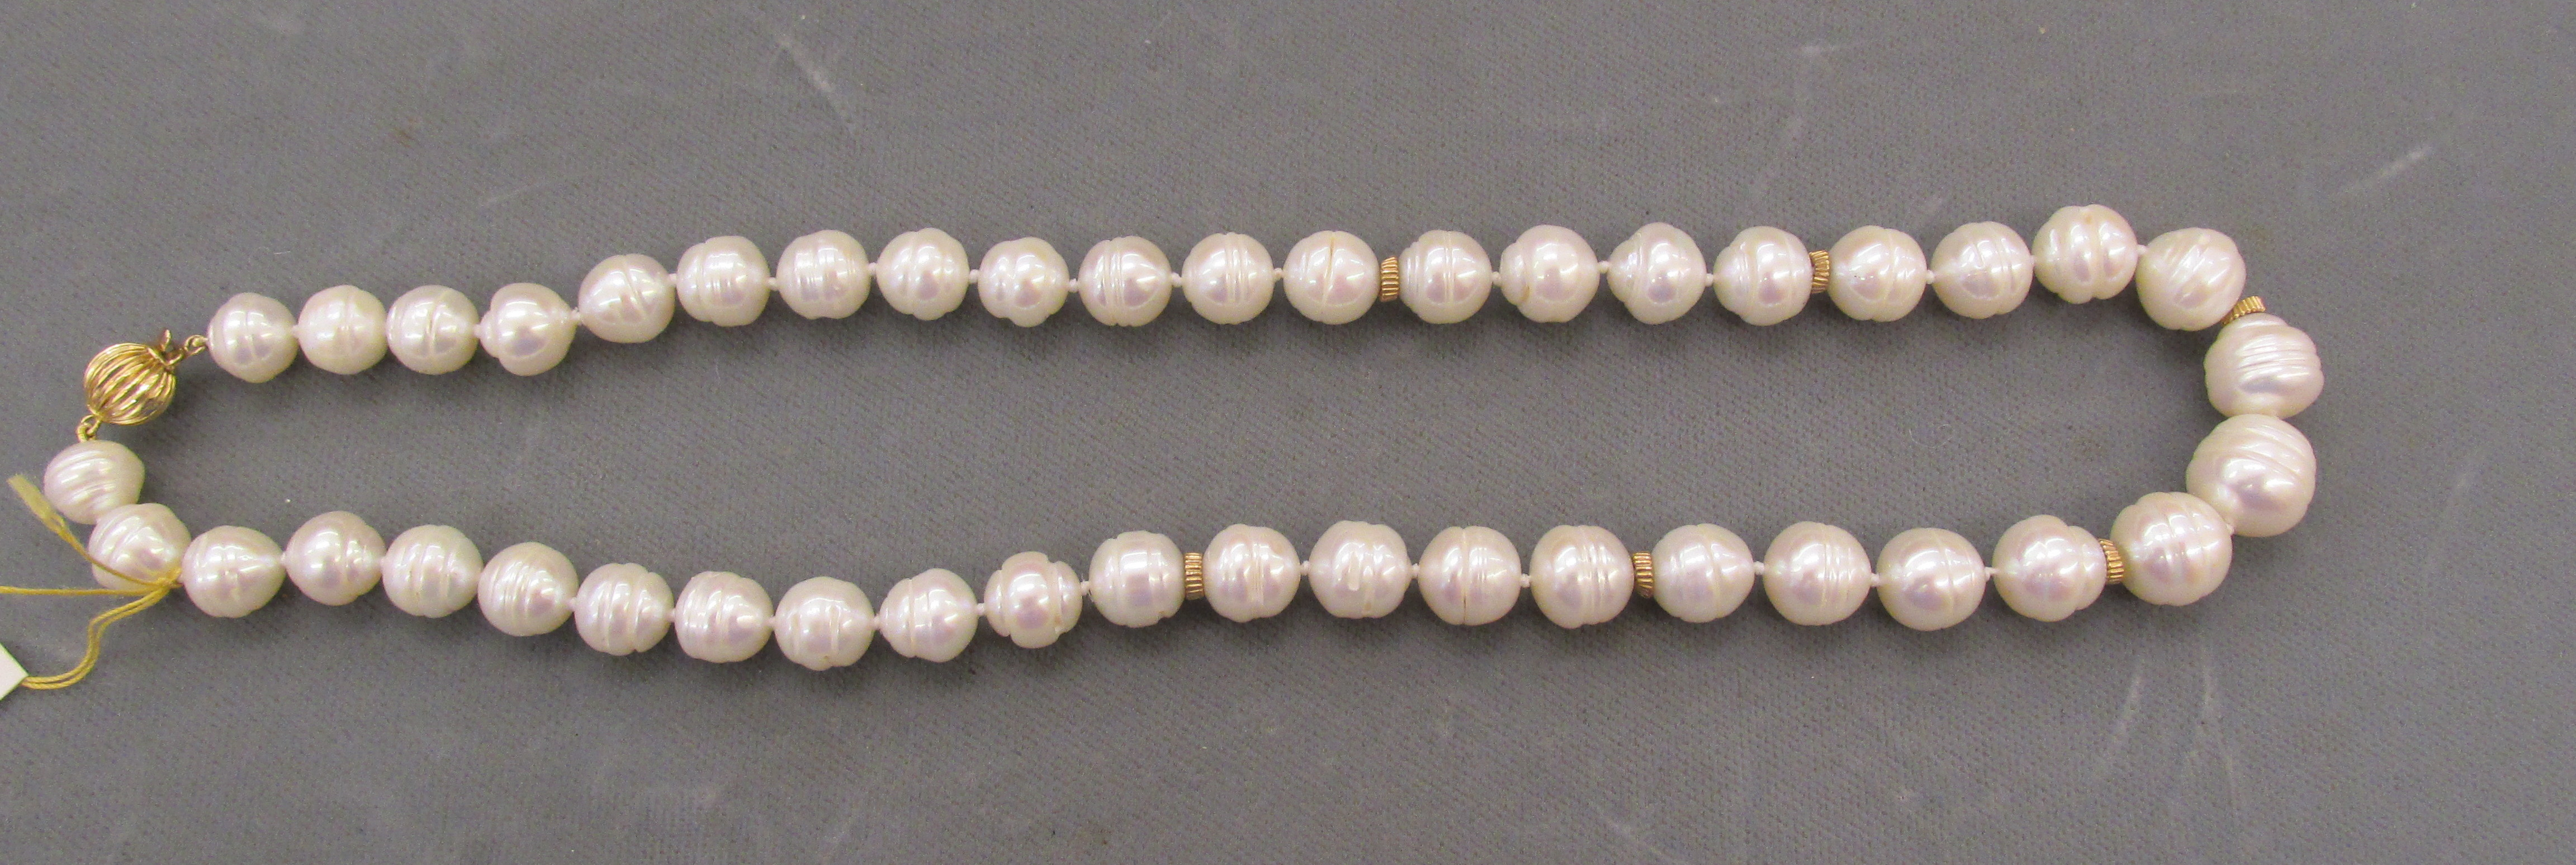 7mm x 10mm White Baroque Pearls Strand 18